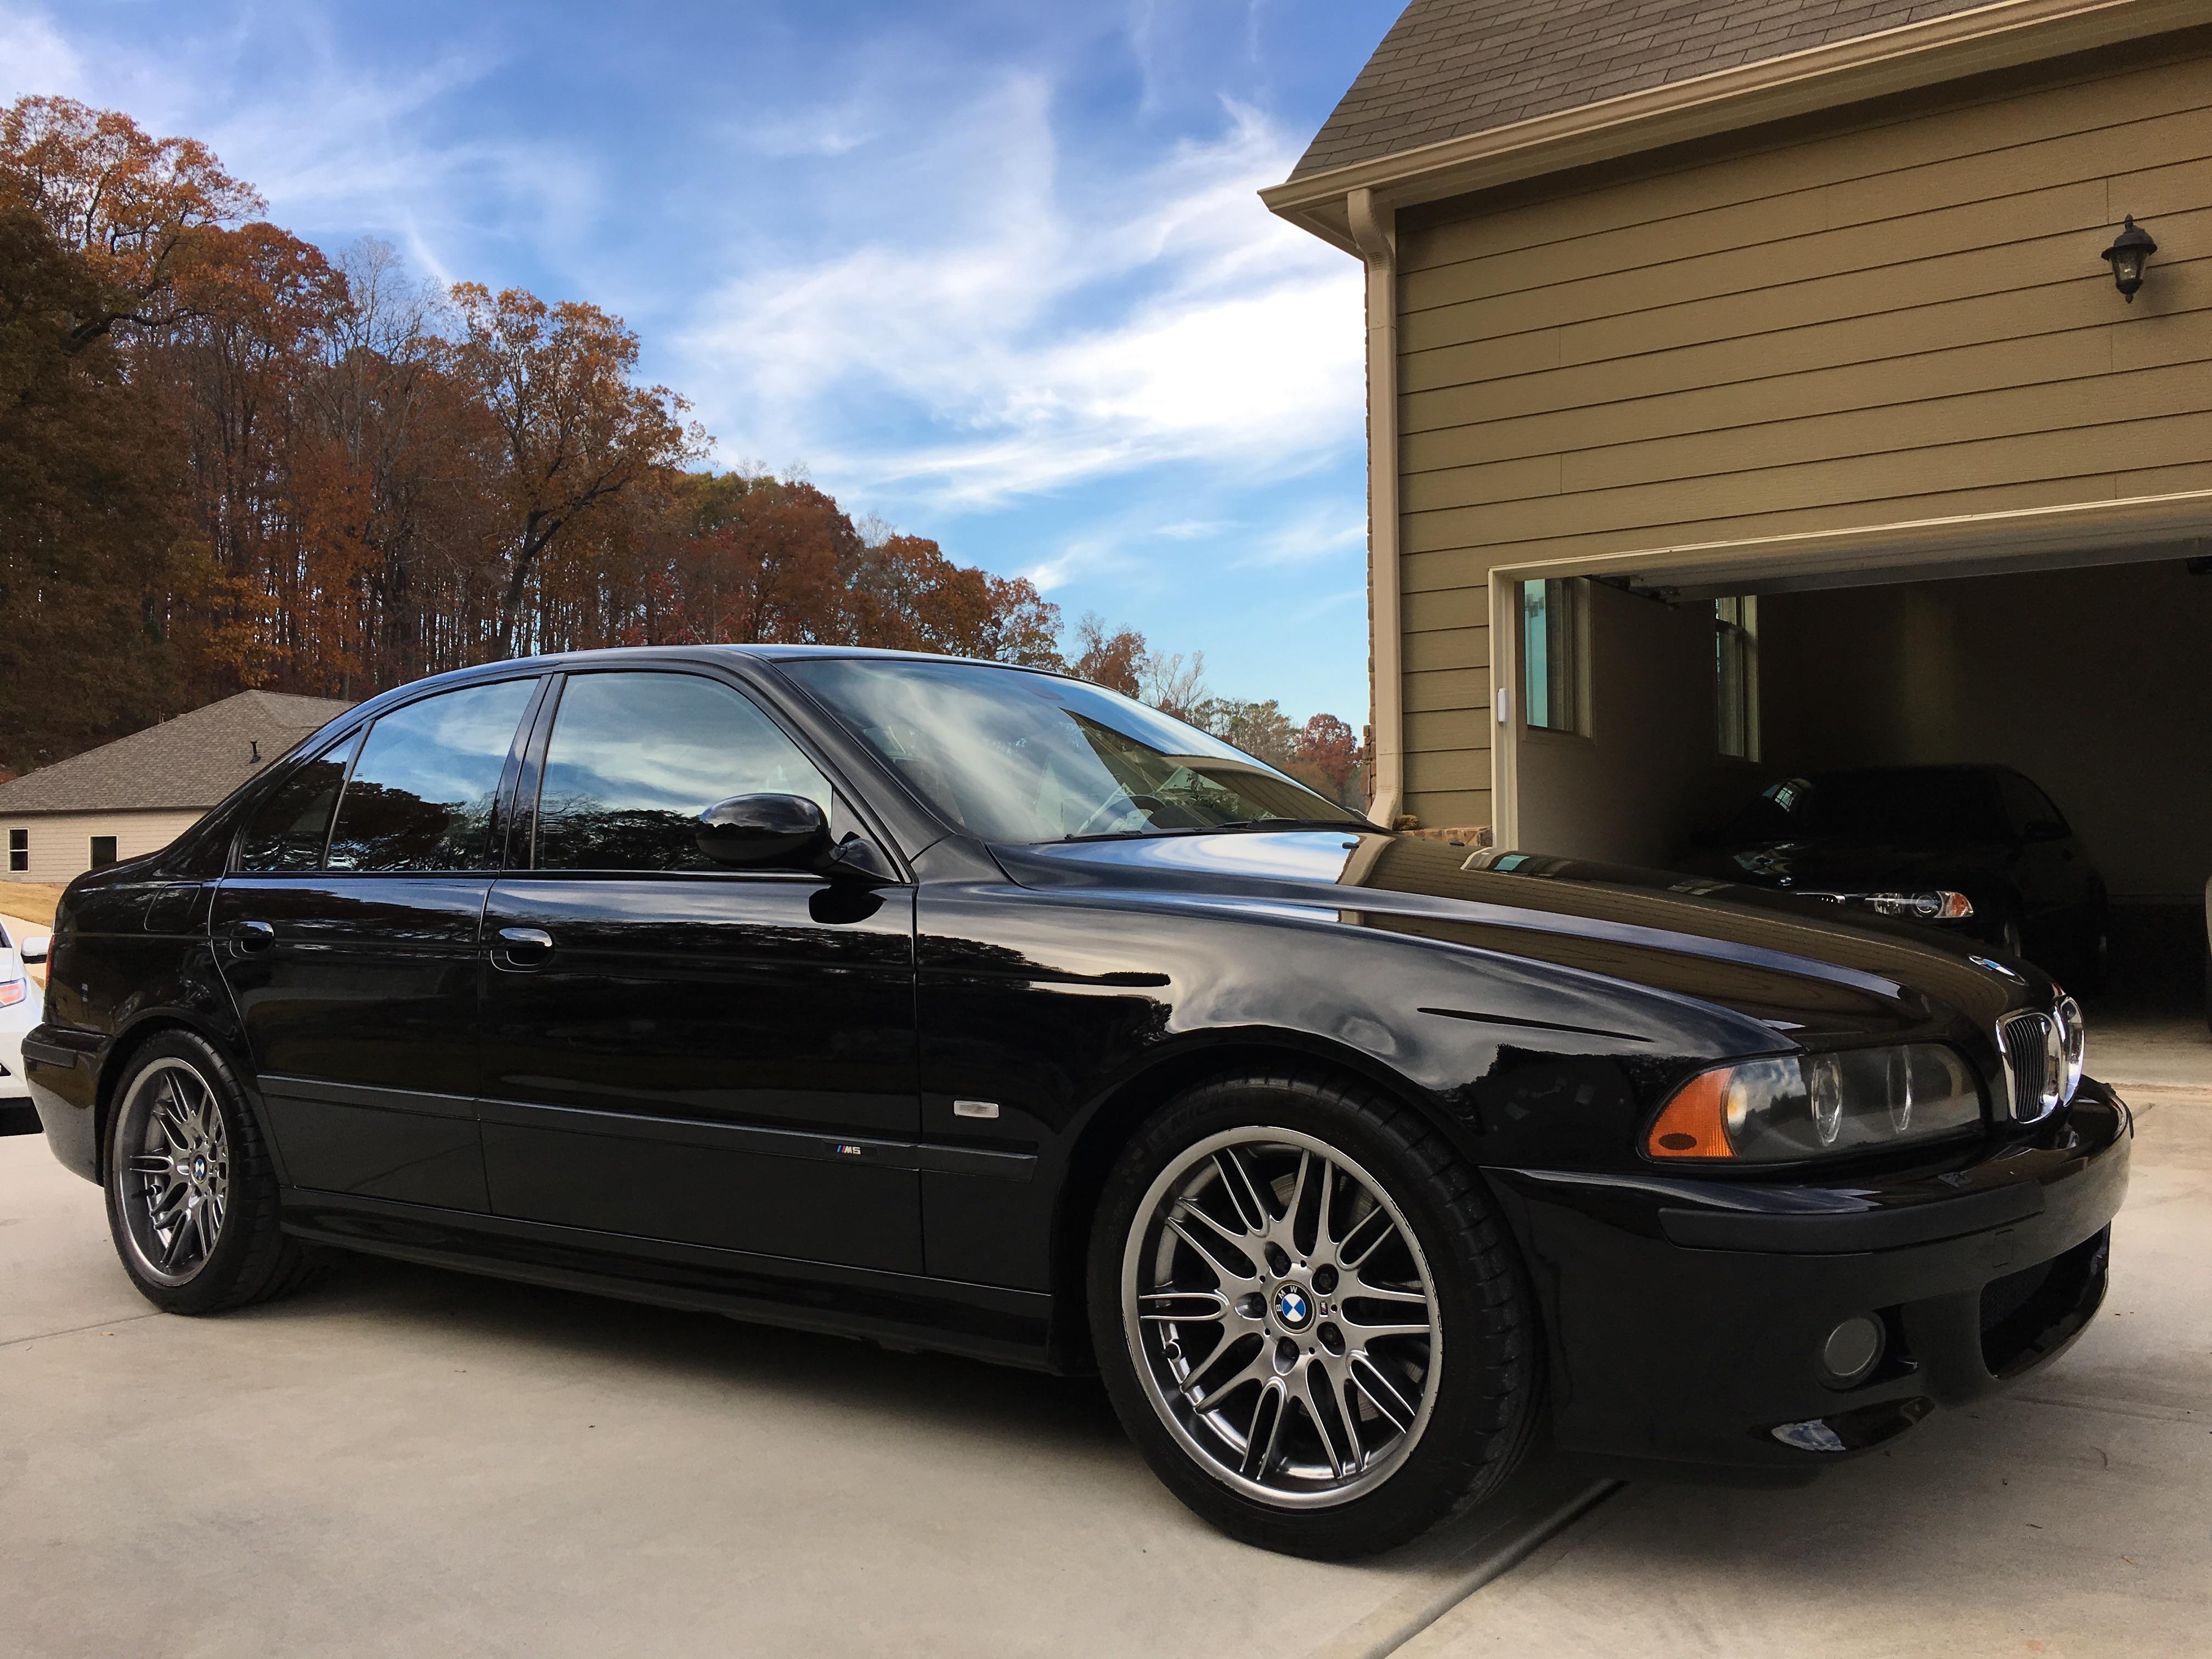 E39 96 03 For Sale 2002 Bmw M5 Jet Black Black With